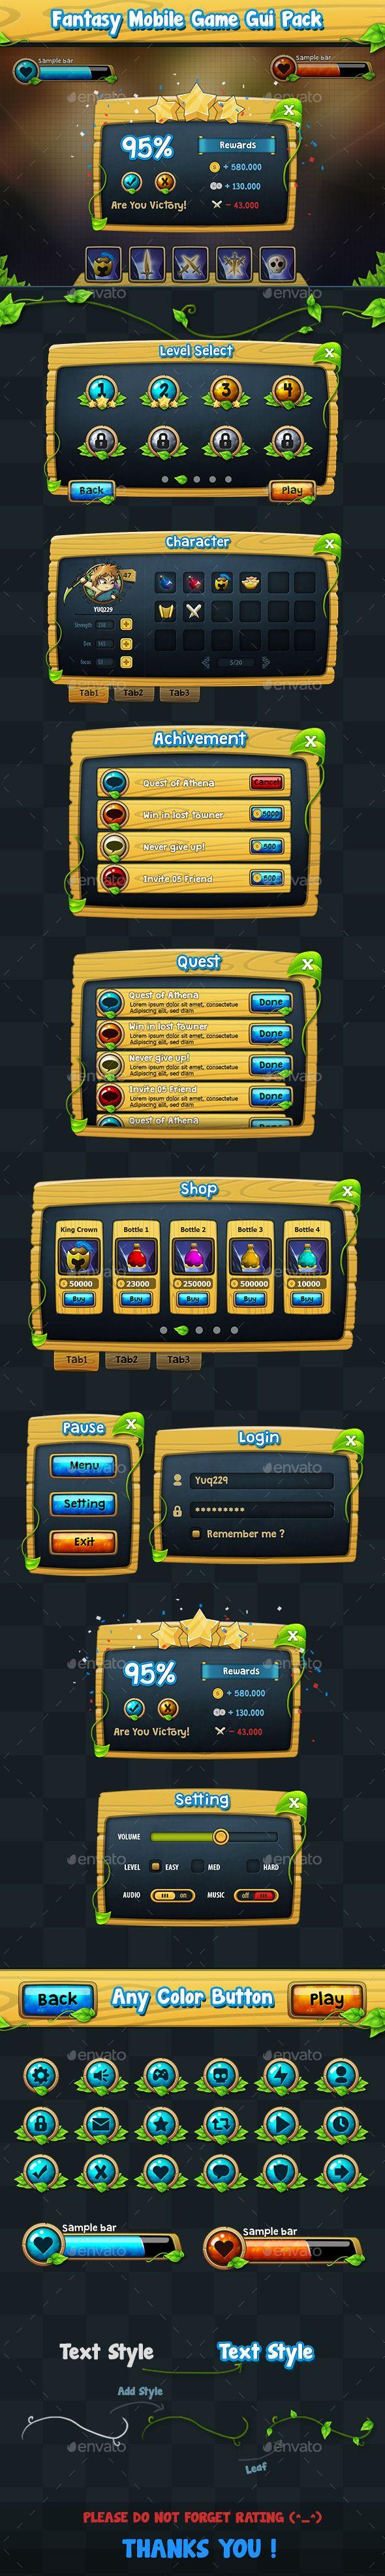 Fantasy Game Gui Pack v2 - User Interfaces Game Assets